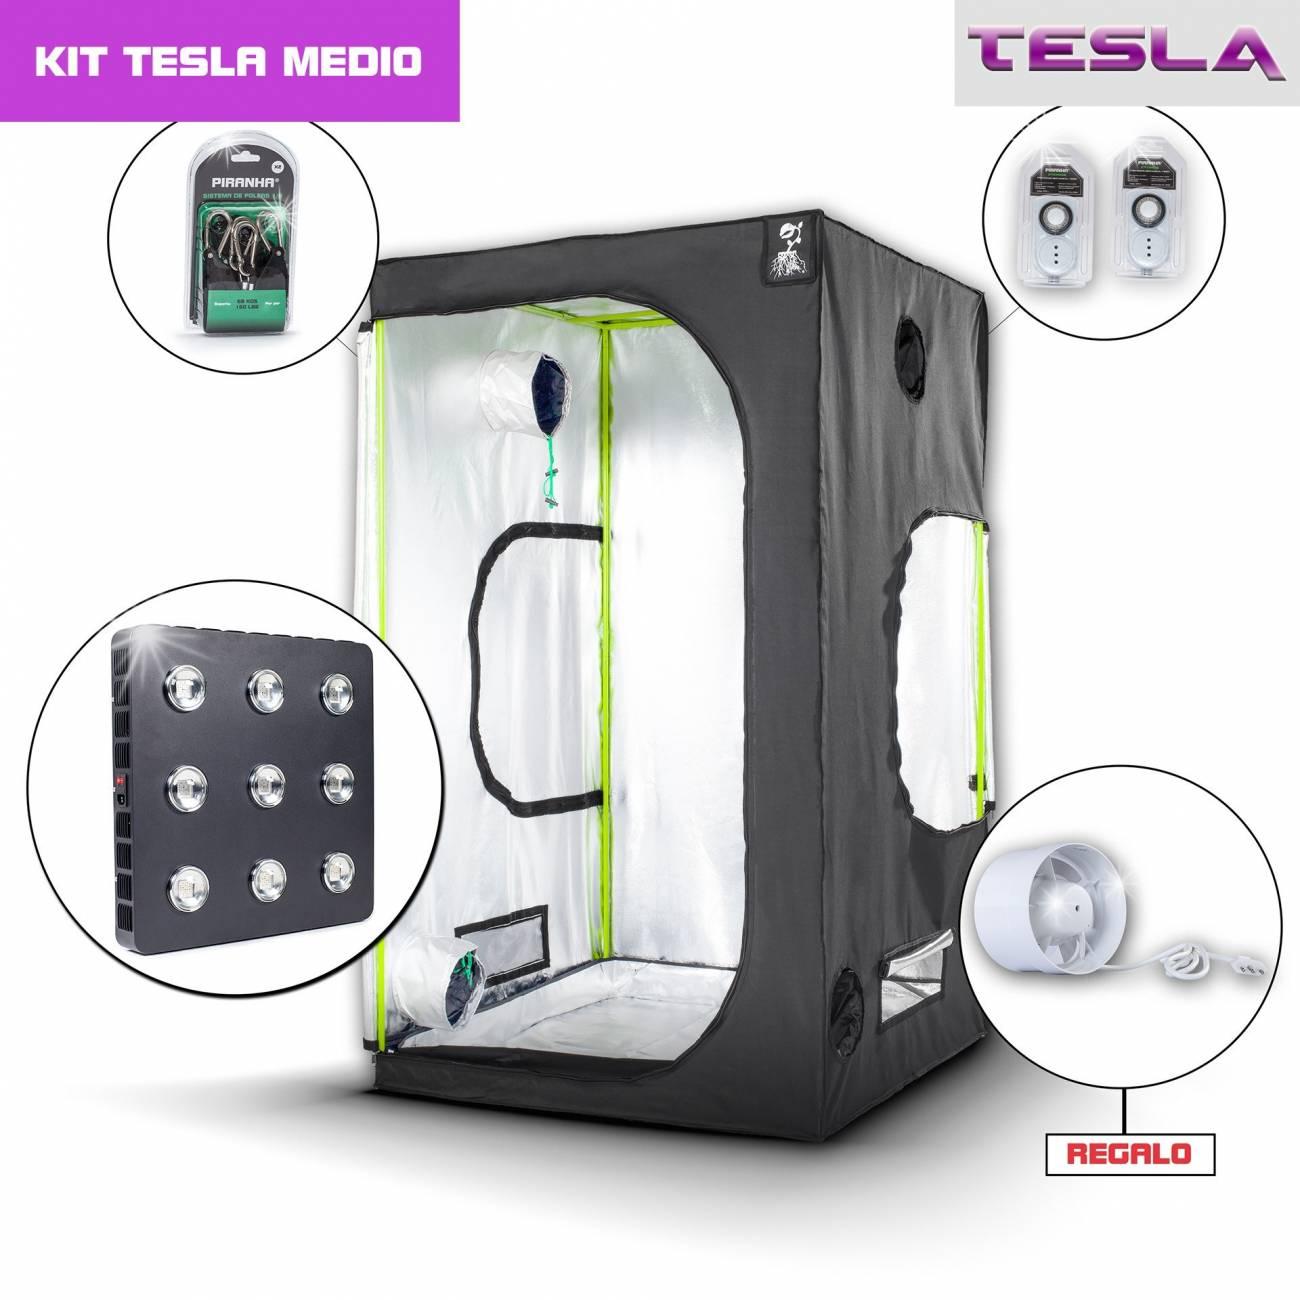 Kit Tesla 120 - T810W Medio